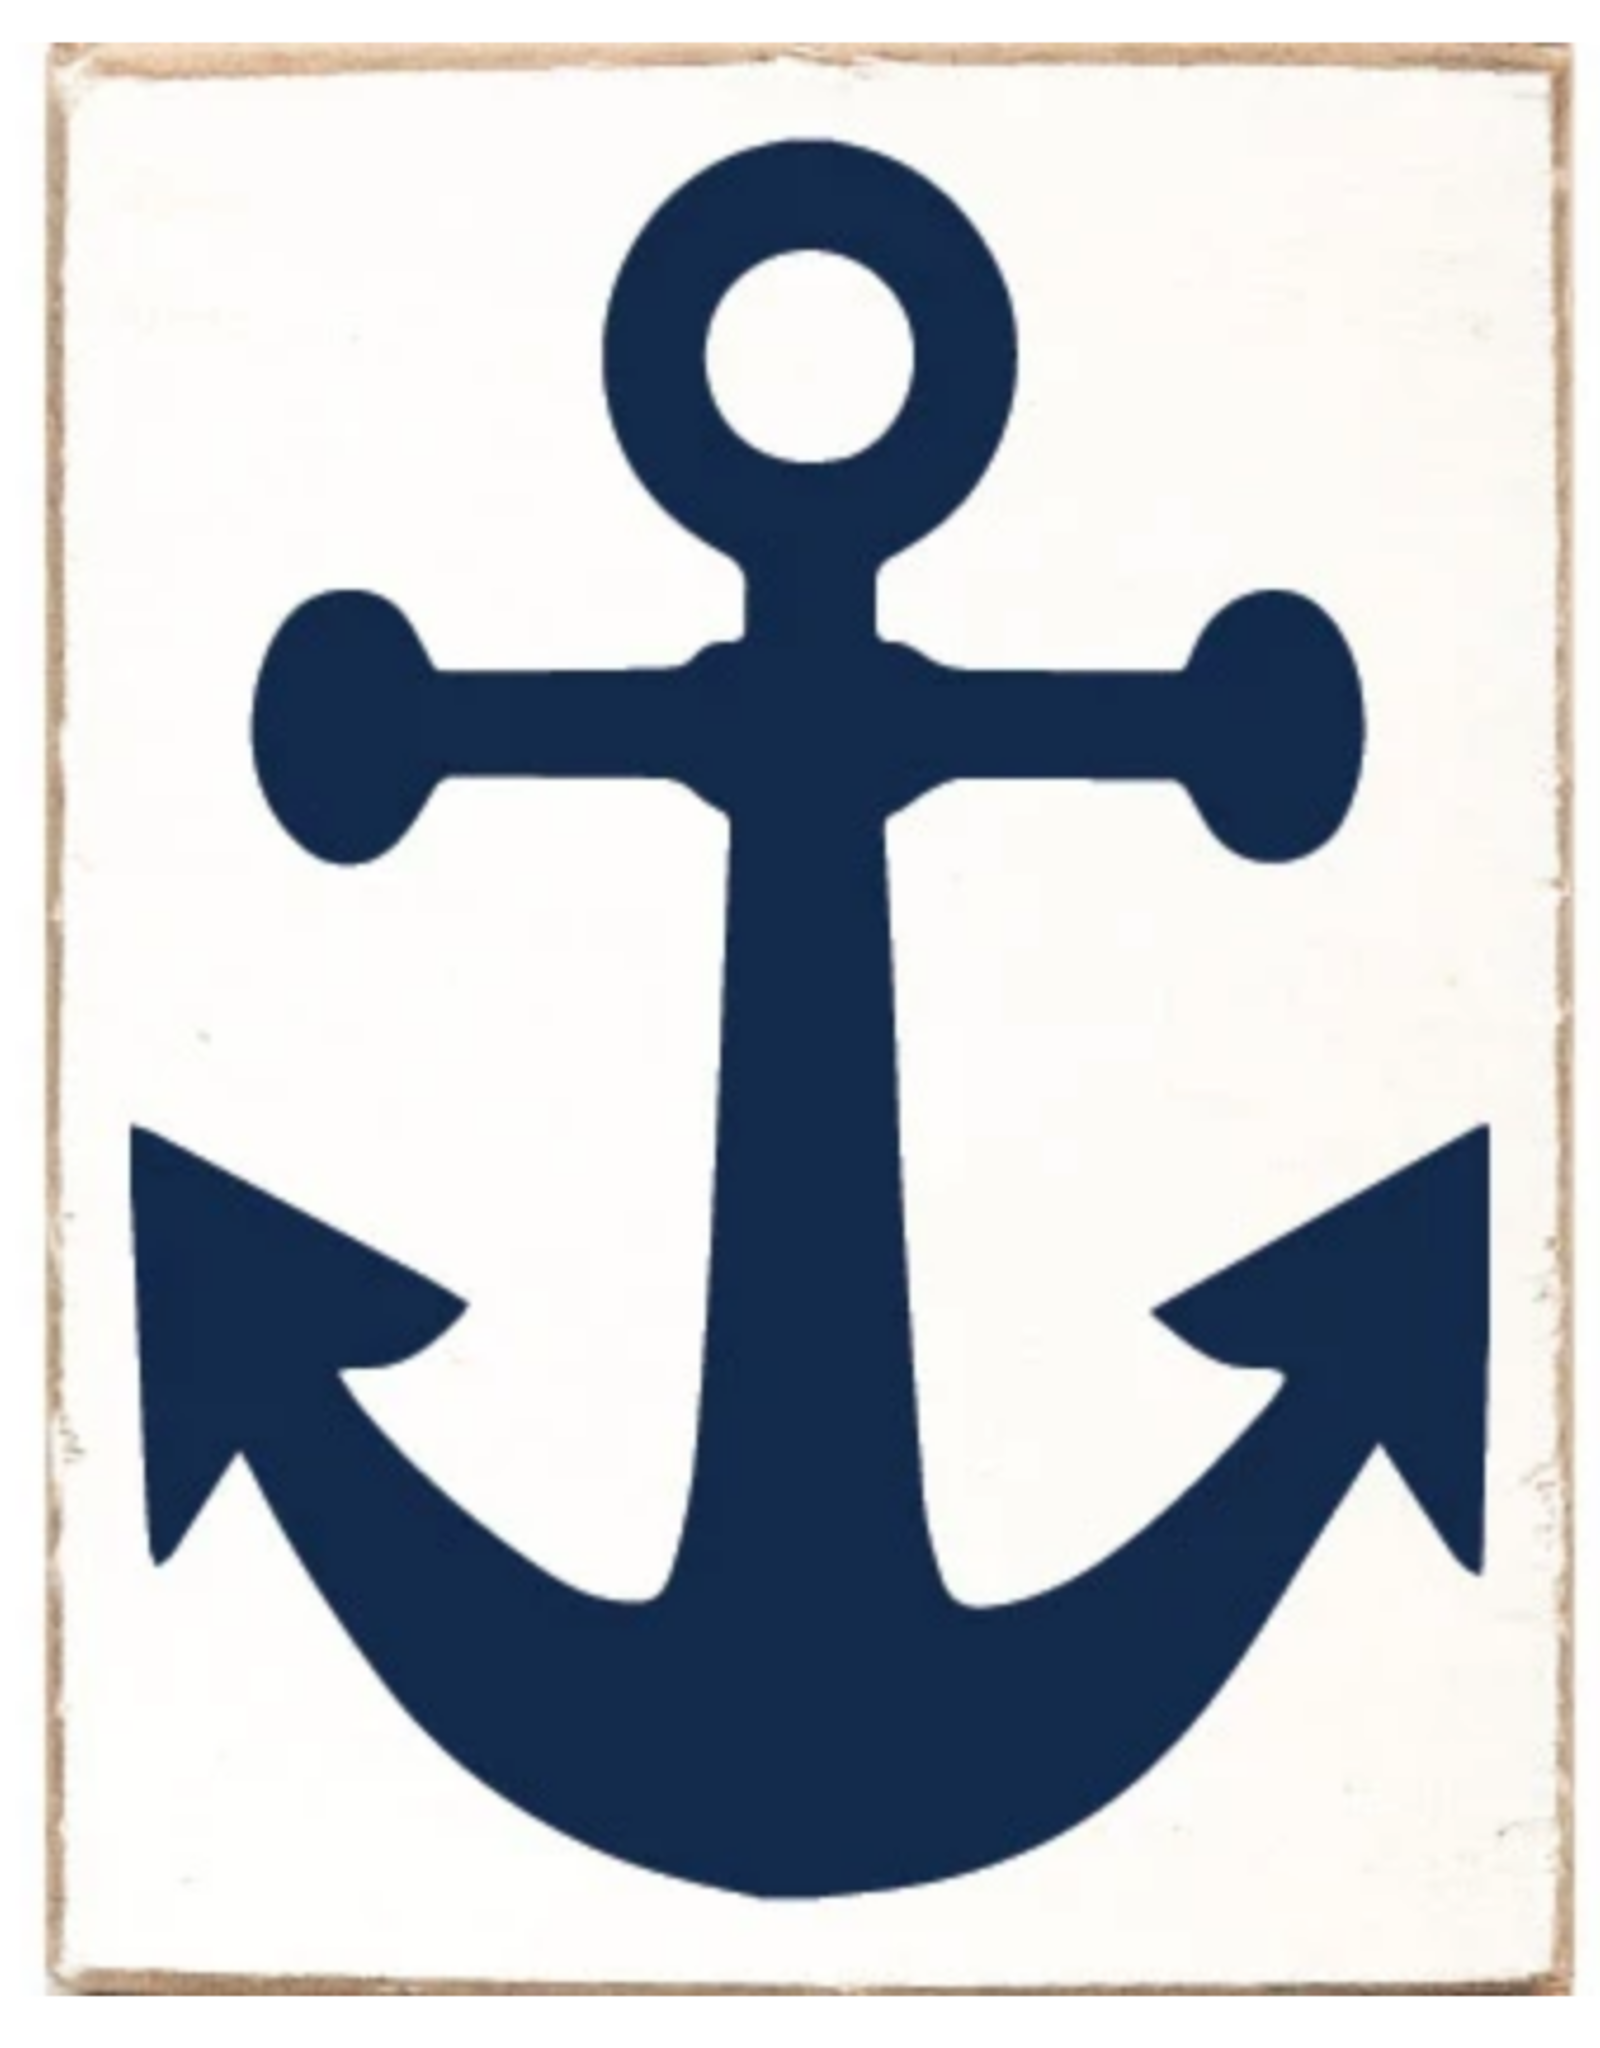 Rustic Marlin Rustic Marlin - Wood Block Anchor - Blue